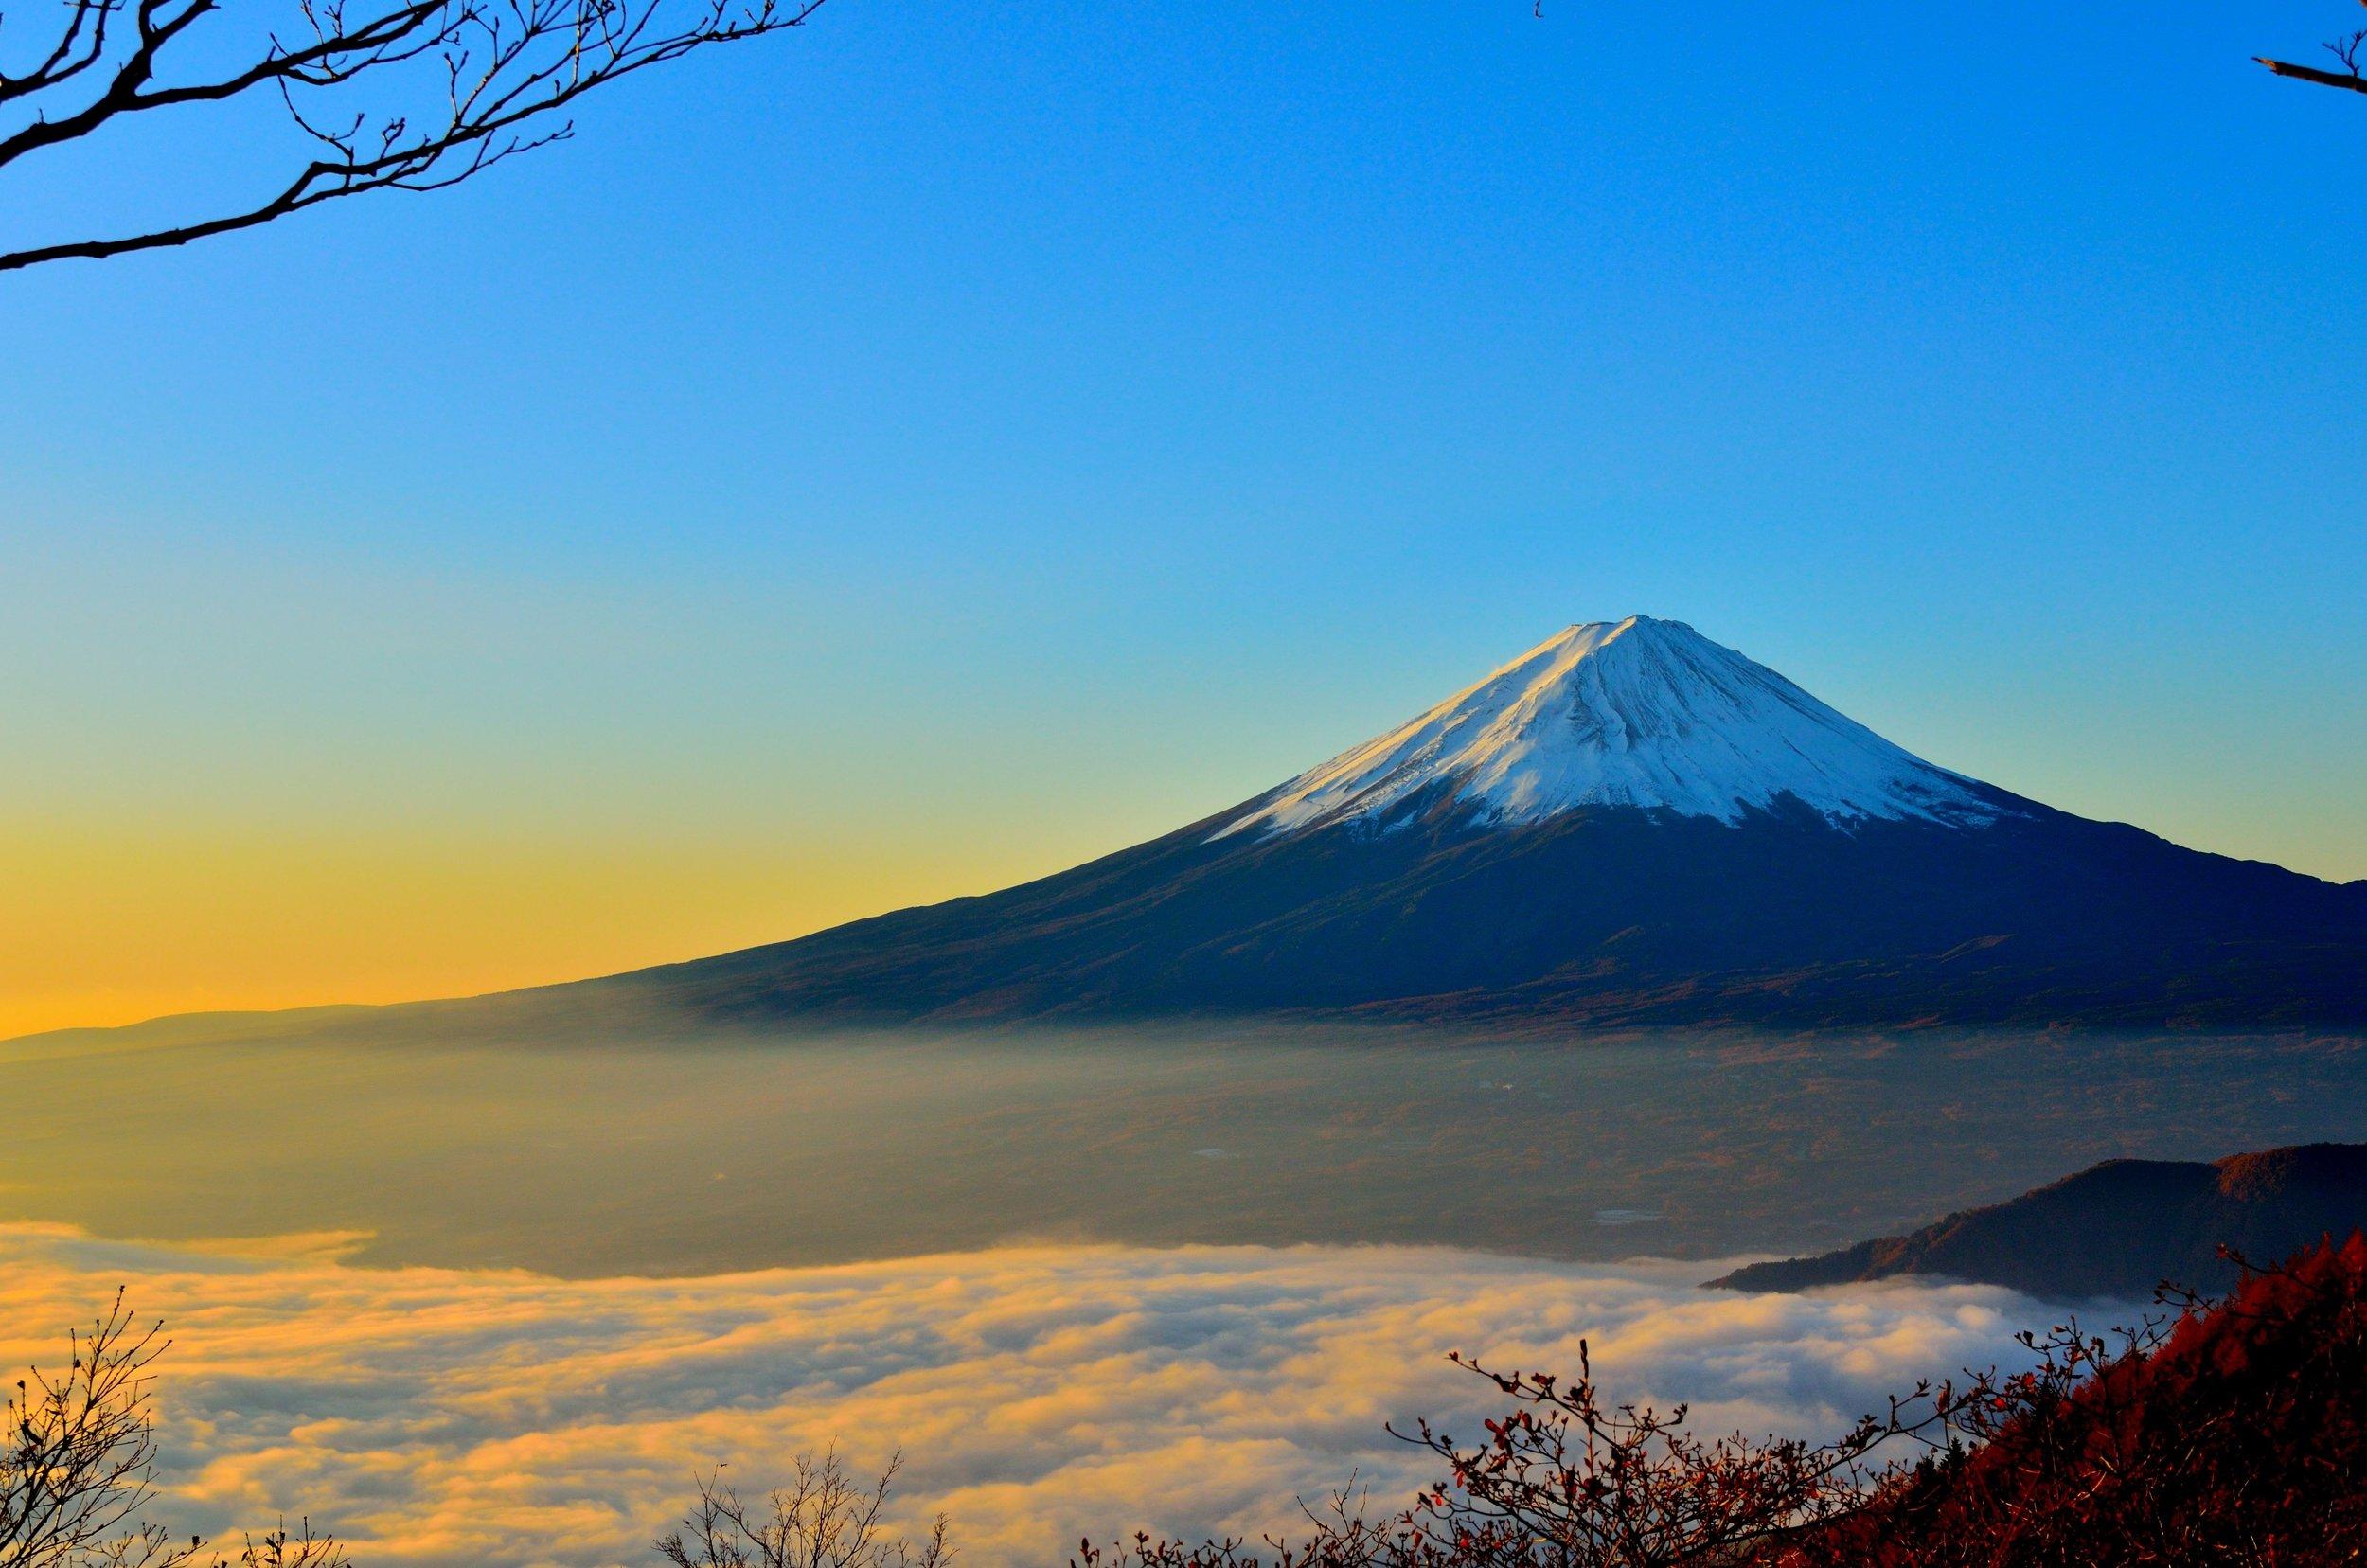 clouds-dawn-desktop-backgrounds-46253.jpg